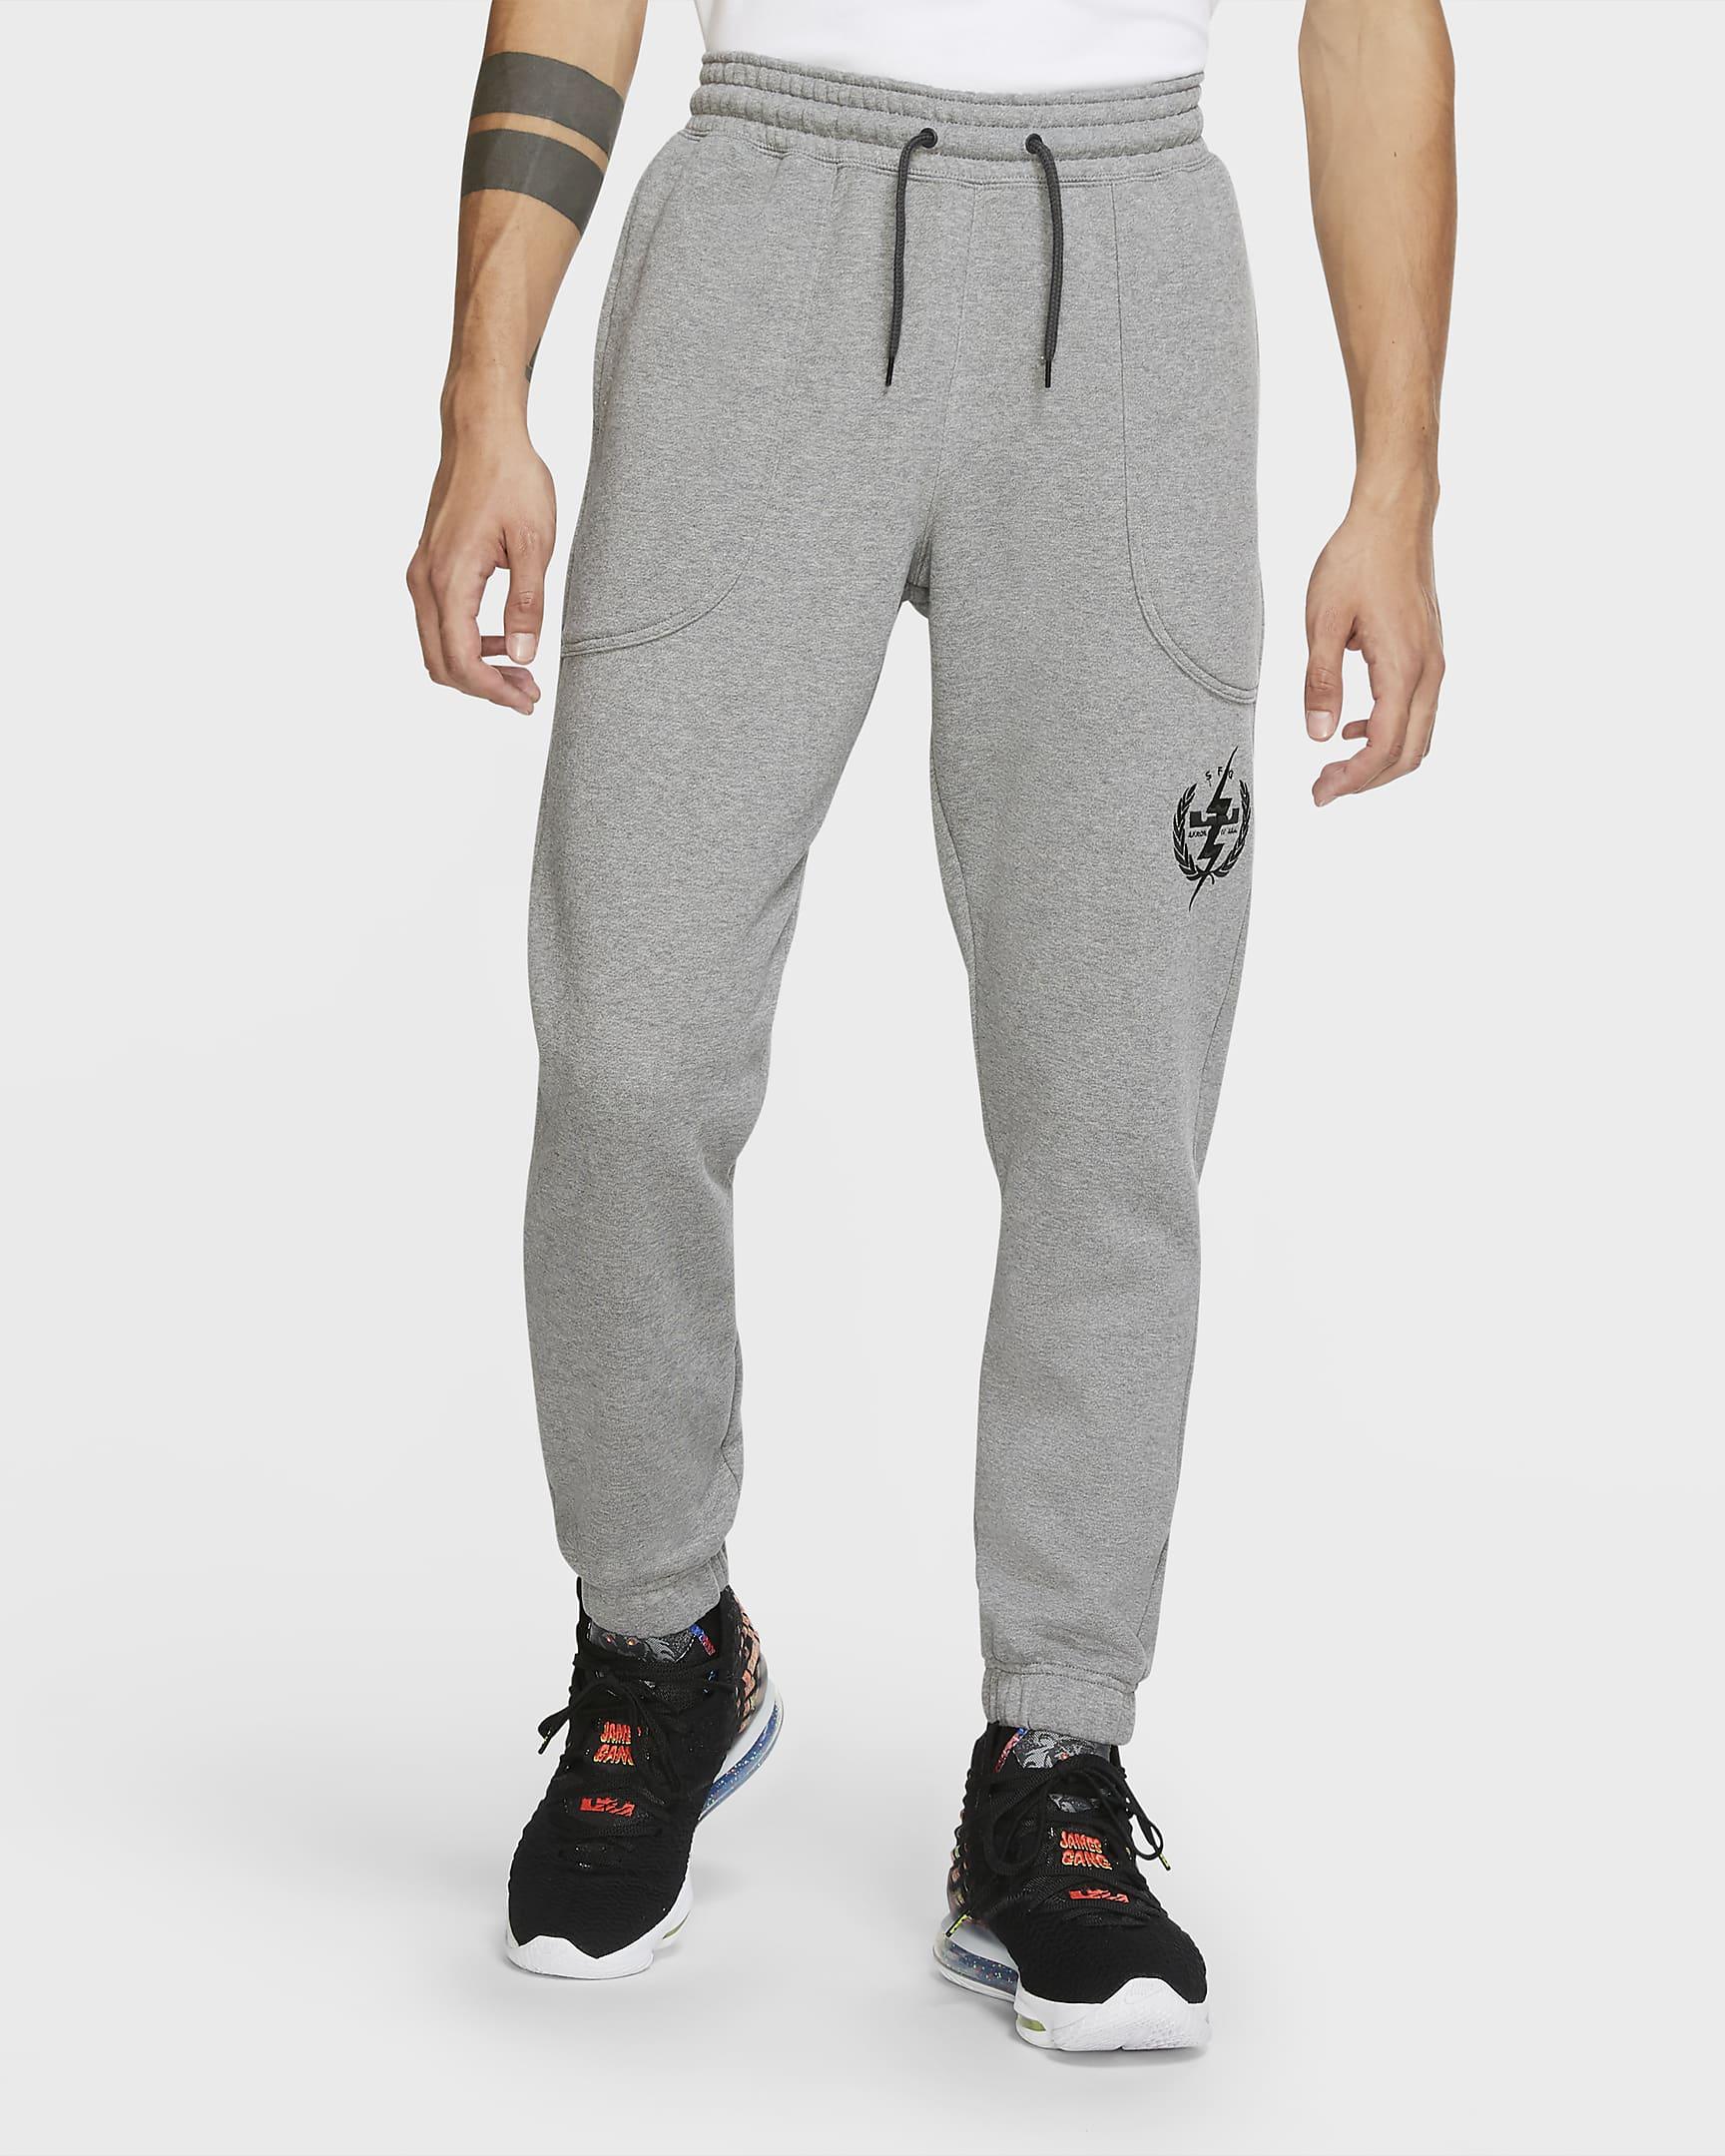 lebron-mens-basketball-pants-G2h2Gl-2